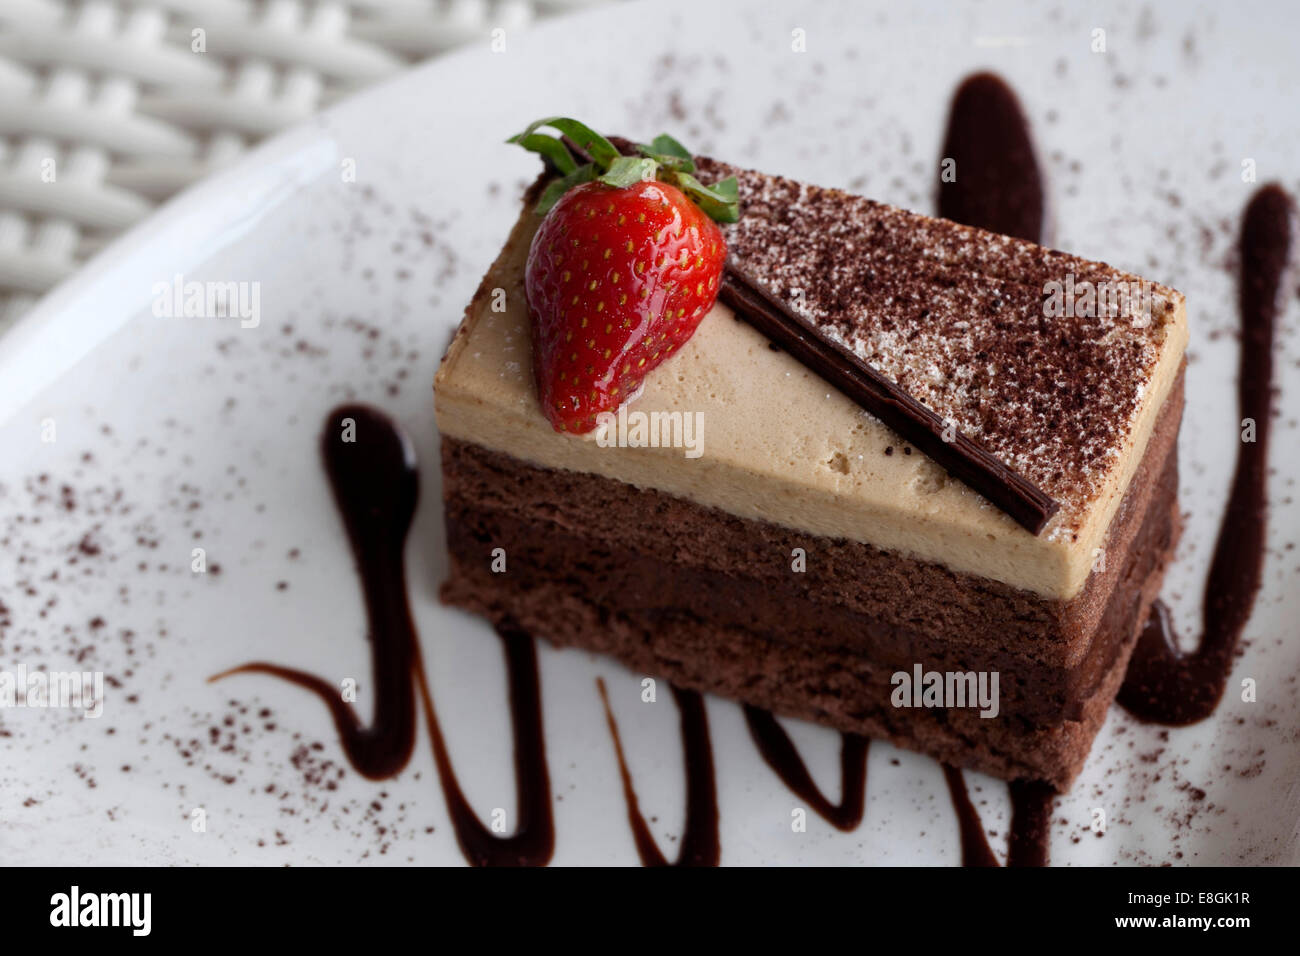 Indonesia, Java, Bandung, Slice of chocolate cake - Stock Image